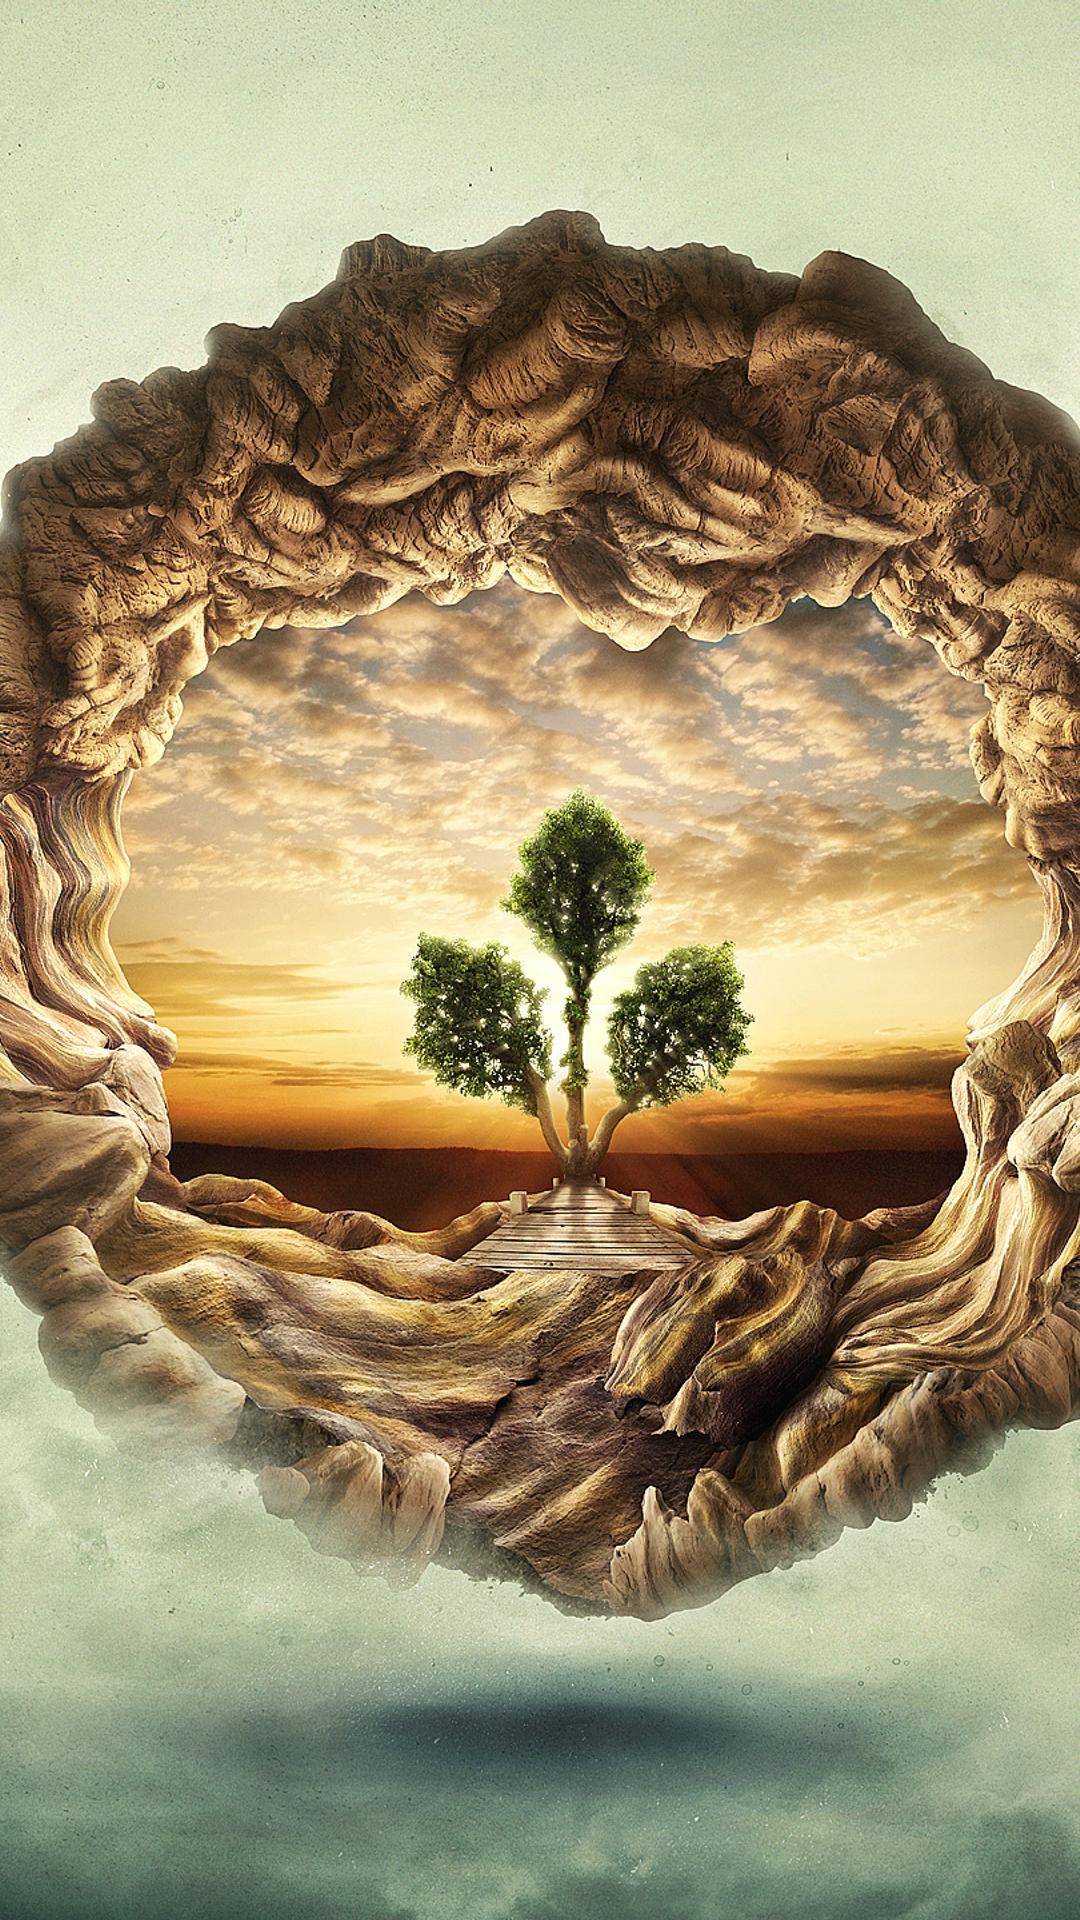 Tree Of Life HD Wallpaper Download 1080x1920